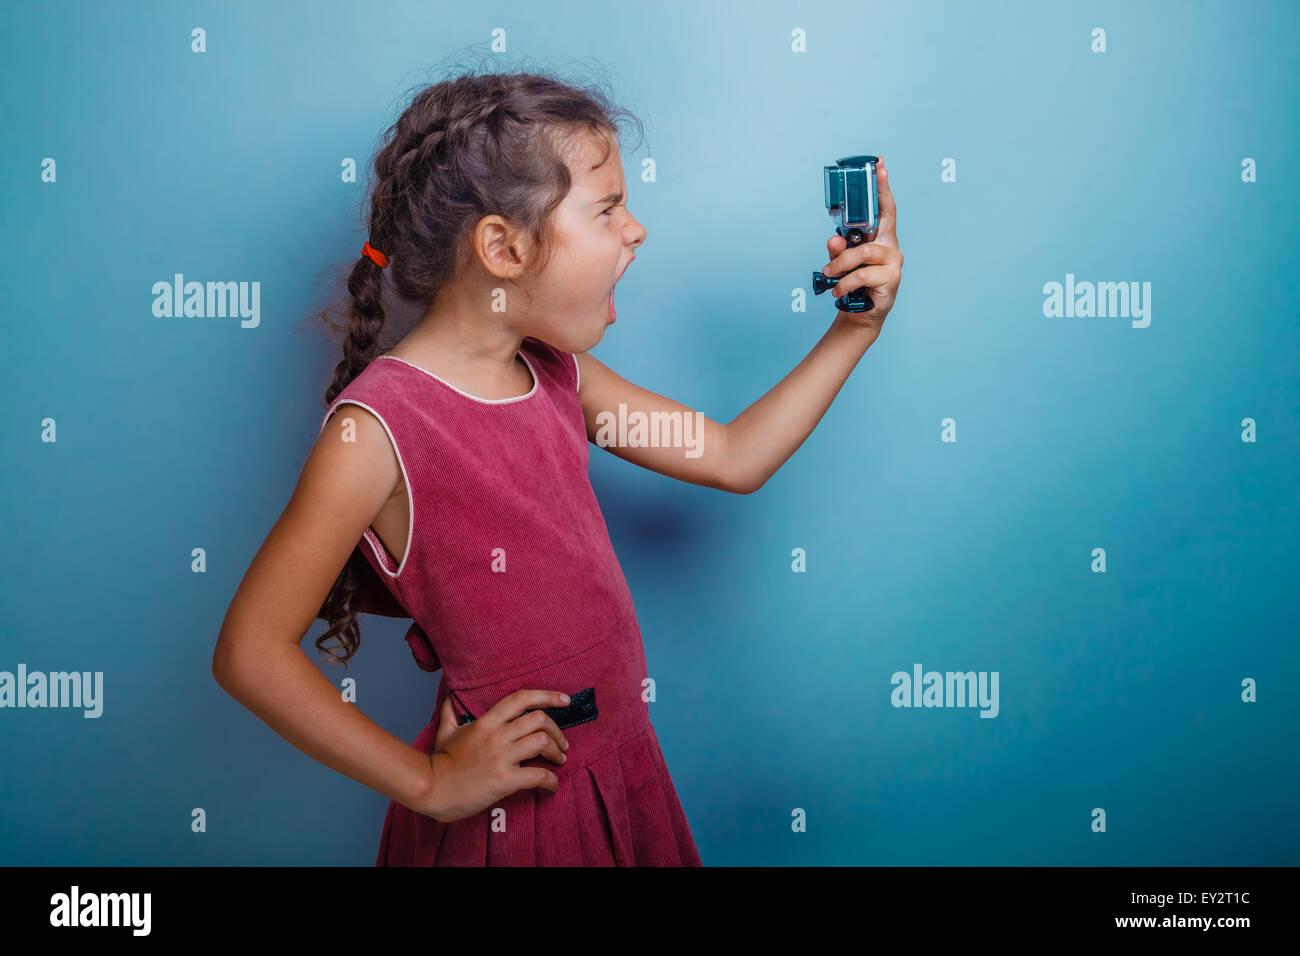 all-teen-girl-action